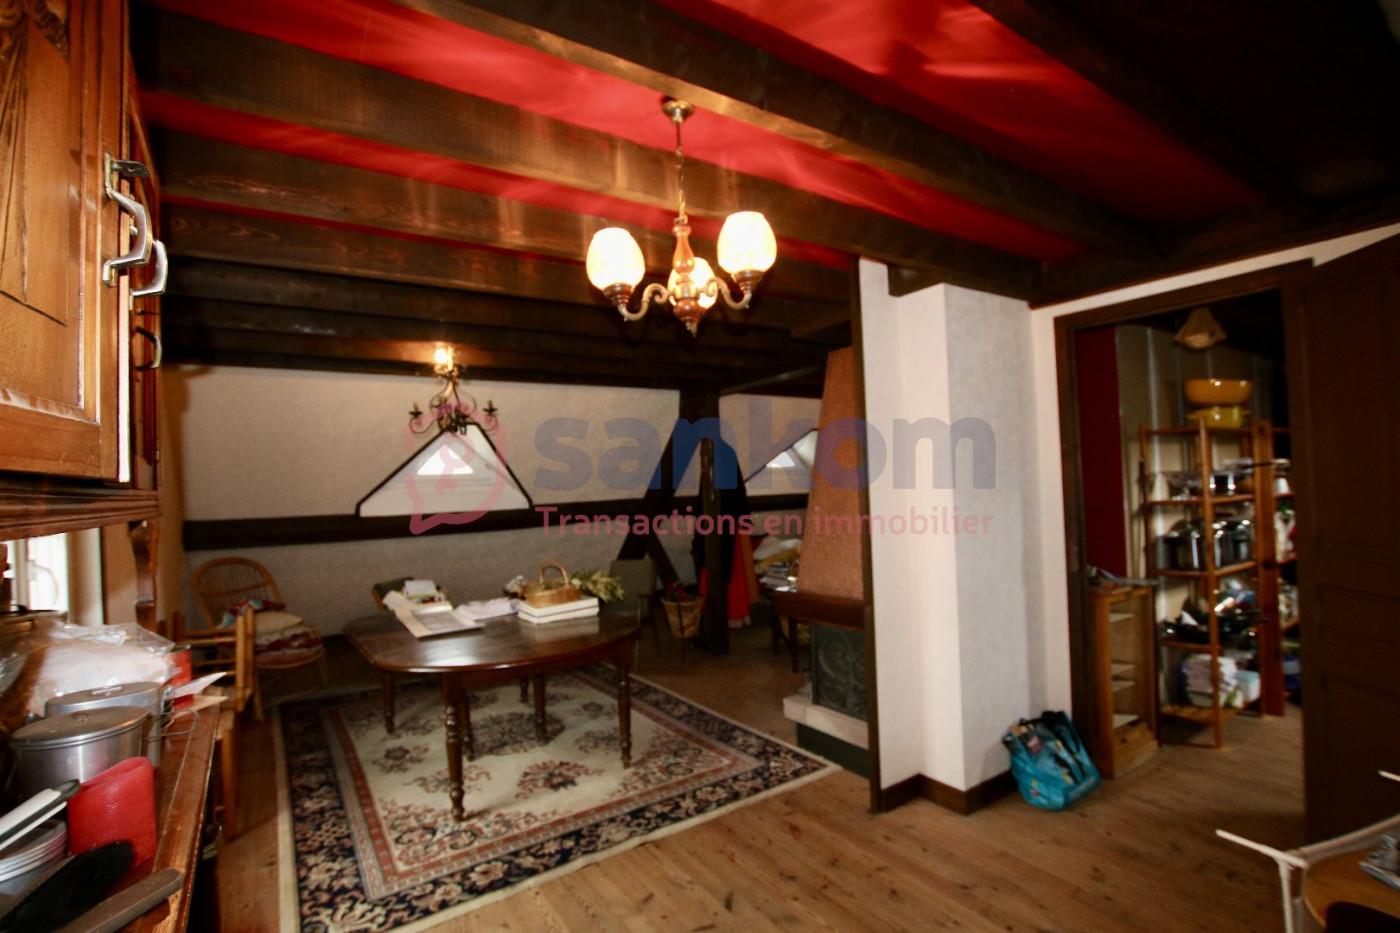 A vendre  Vals Pres Le Puy | Réf 43002167 - Belledent nadine